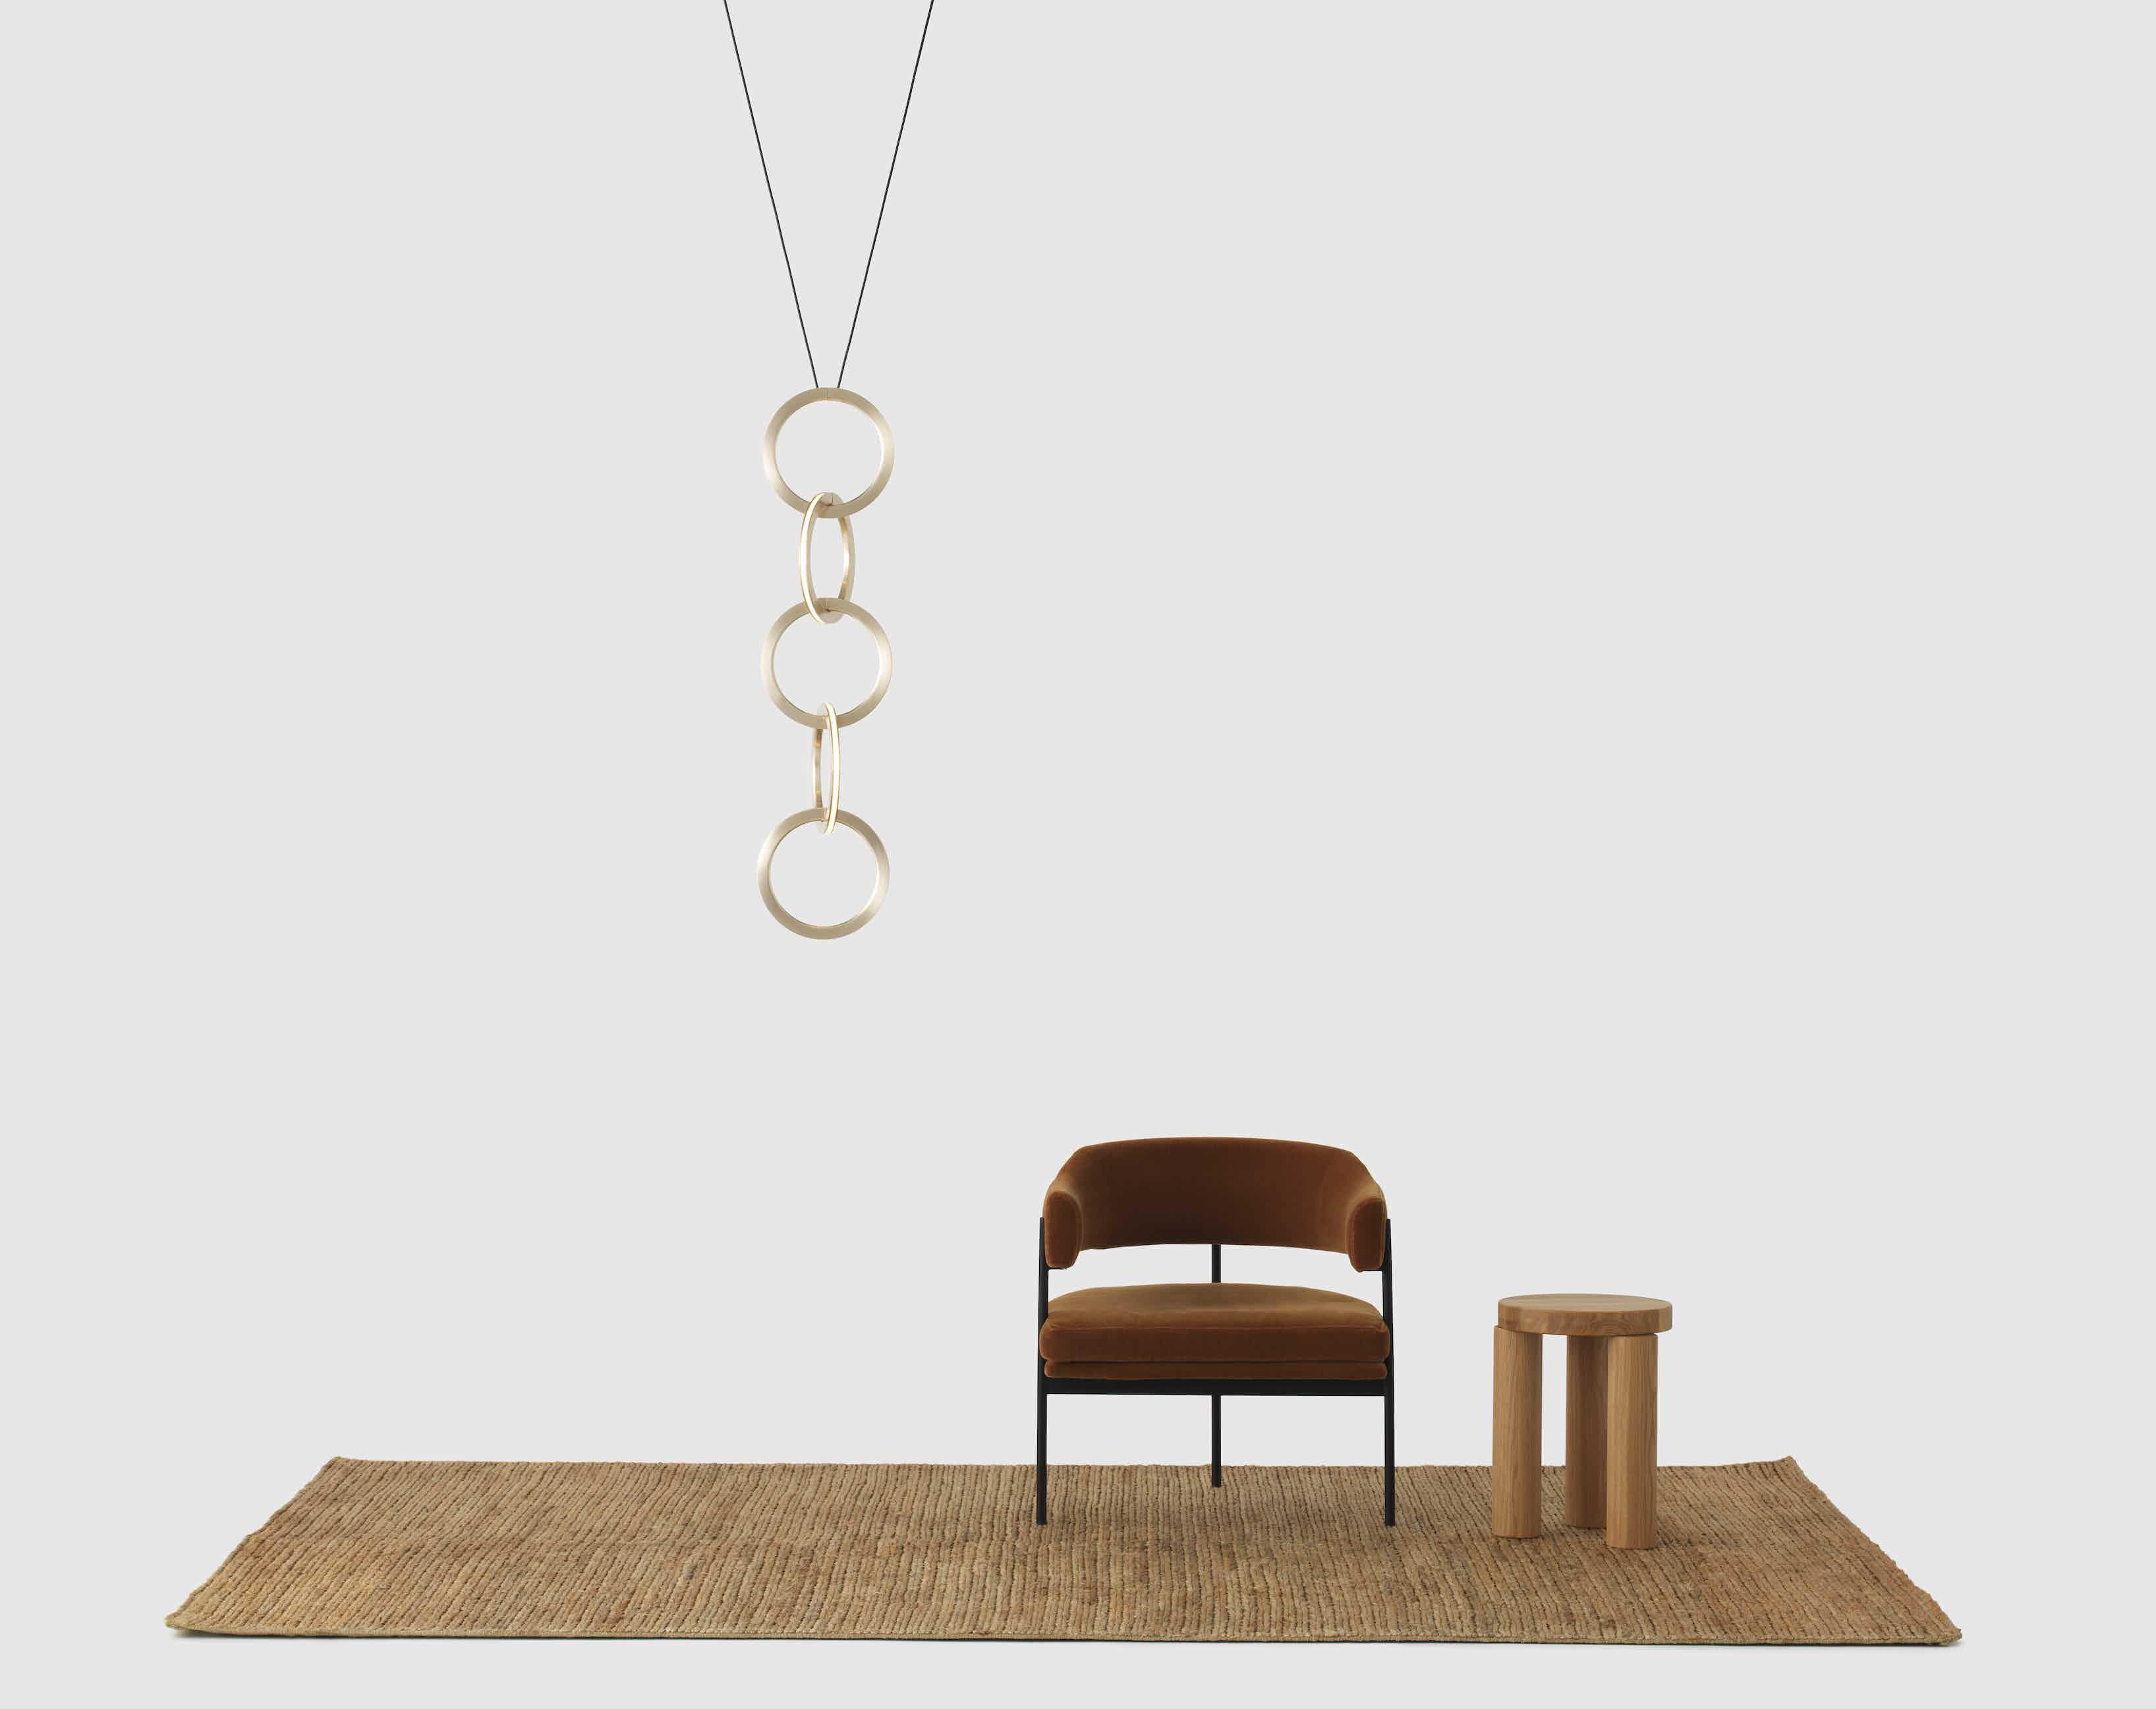 Resident furniture circus 250 pendant insitu five haute living